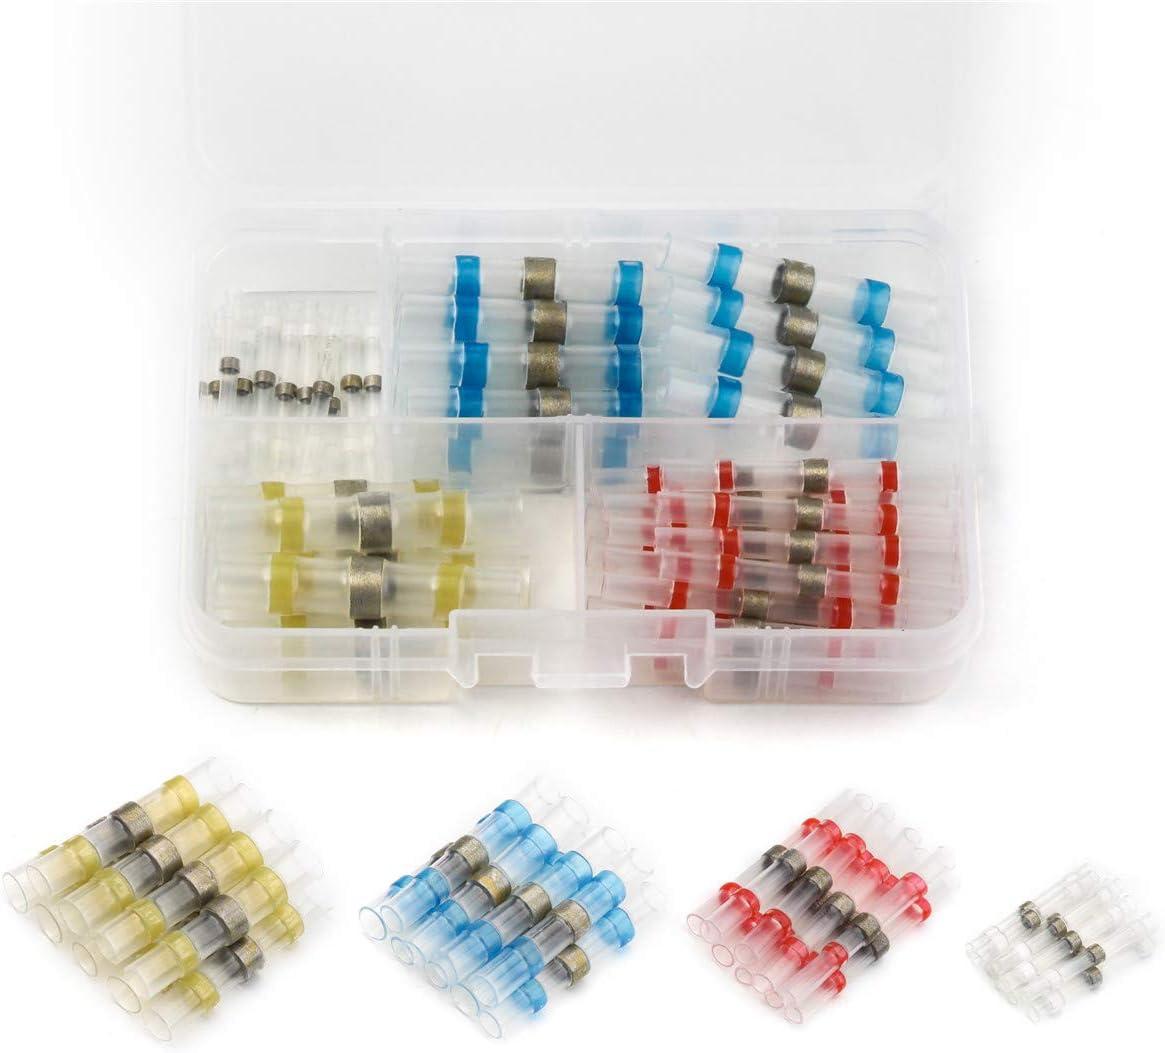 50Pcs 26-24AWG Waterproof Solder Sleeve Heat Shrink Wire Splice Connector White